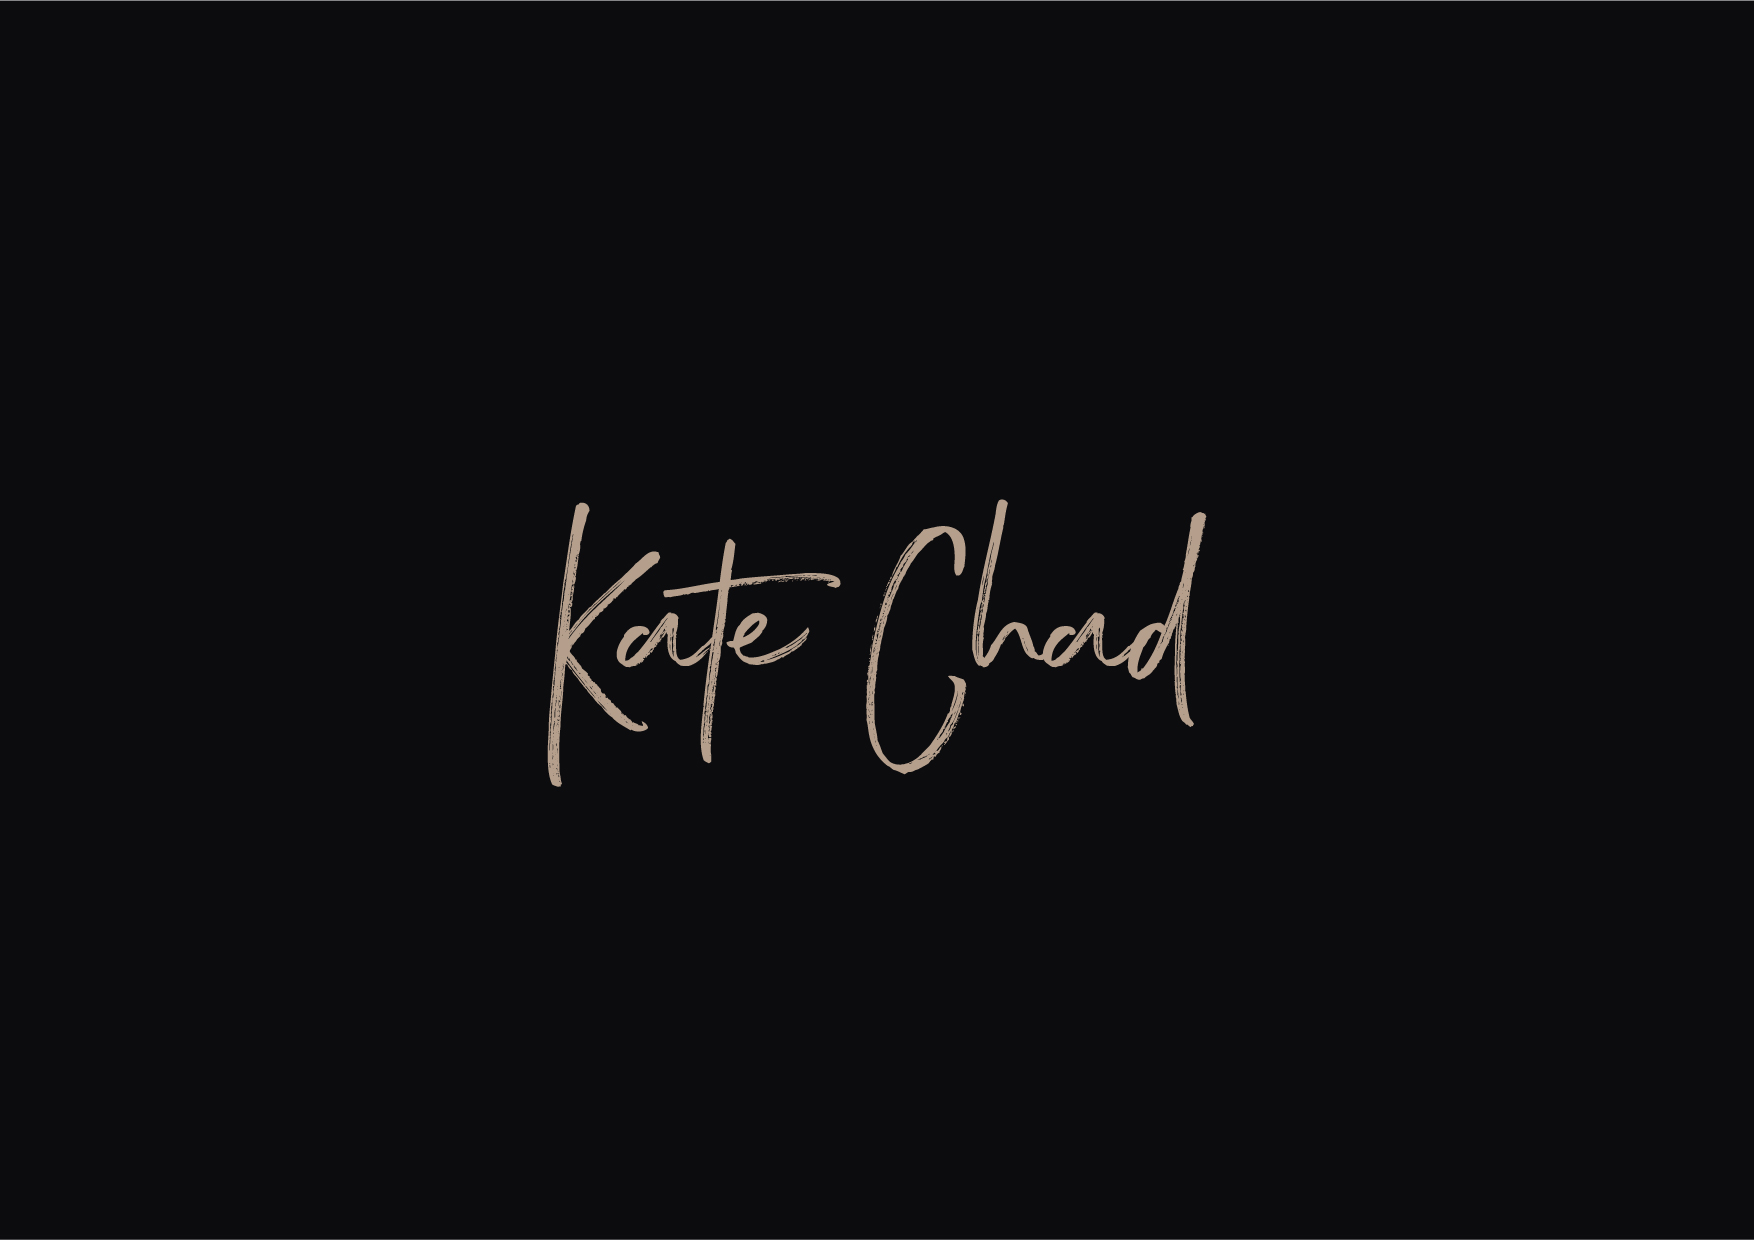 Kate Chad Logo Concept 1_3.jpg